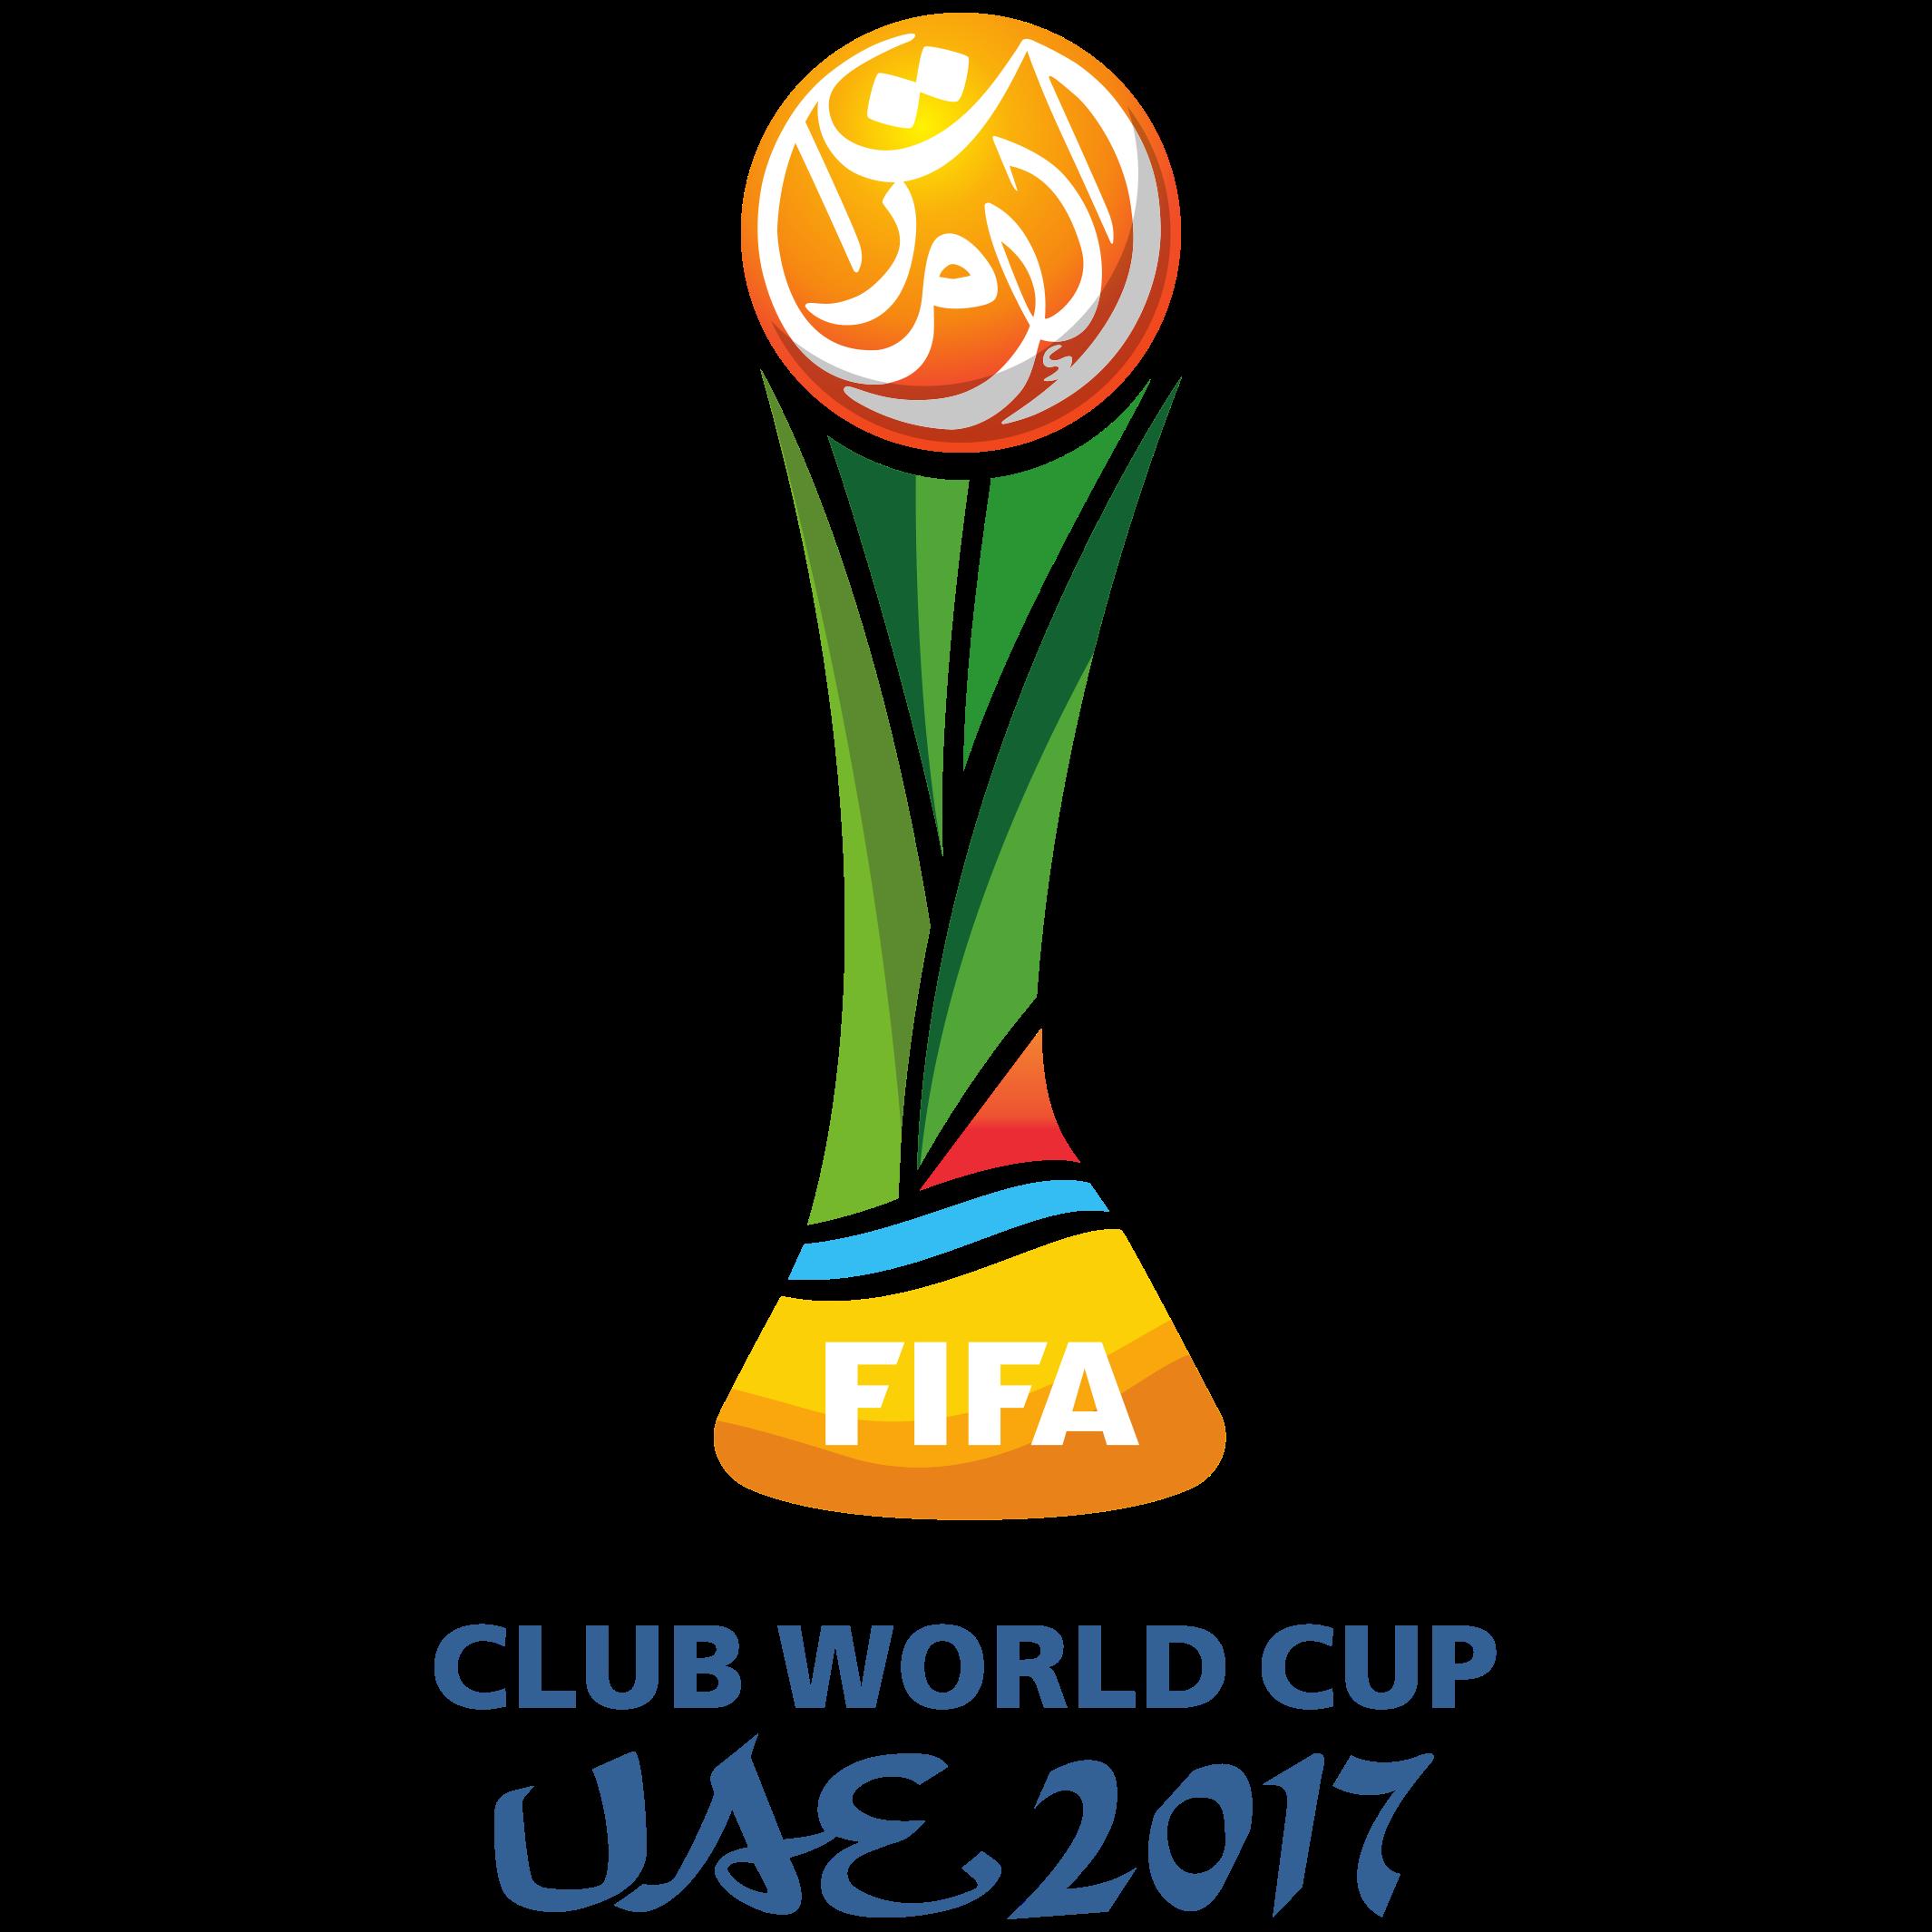 2017 FIFA Club World Cup